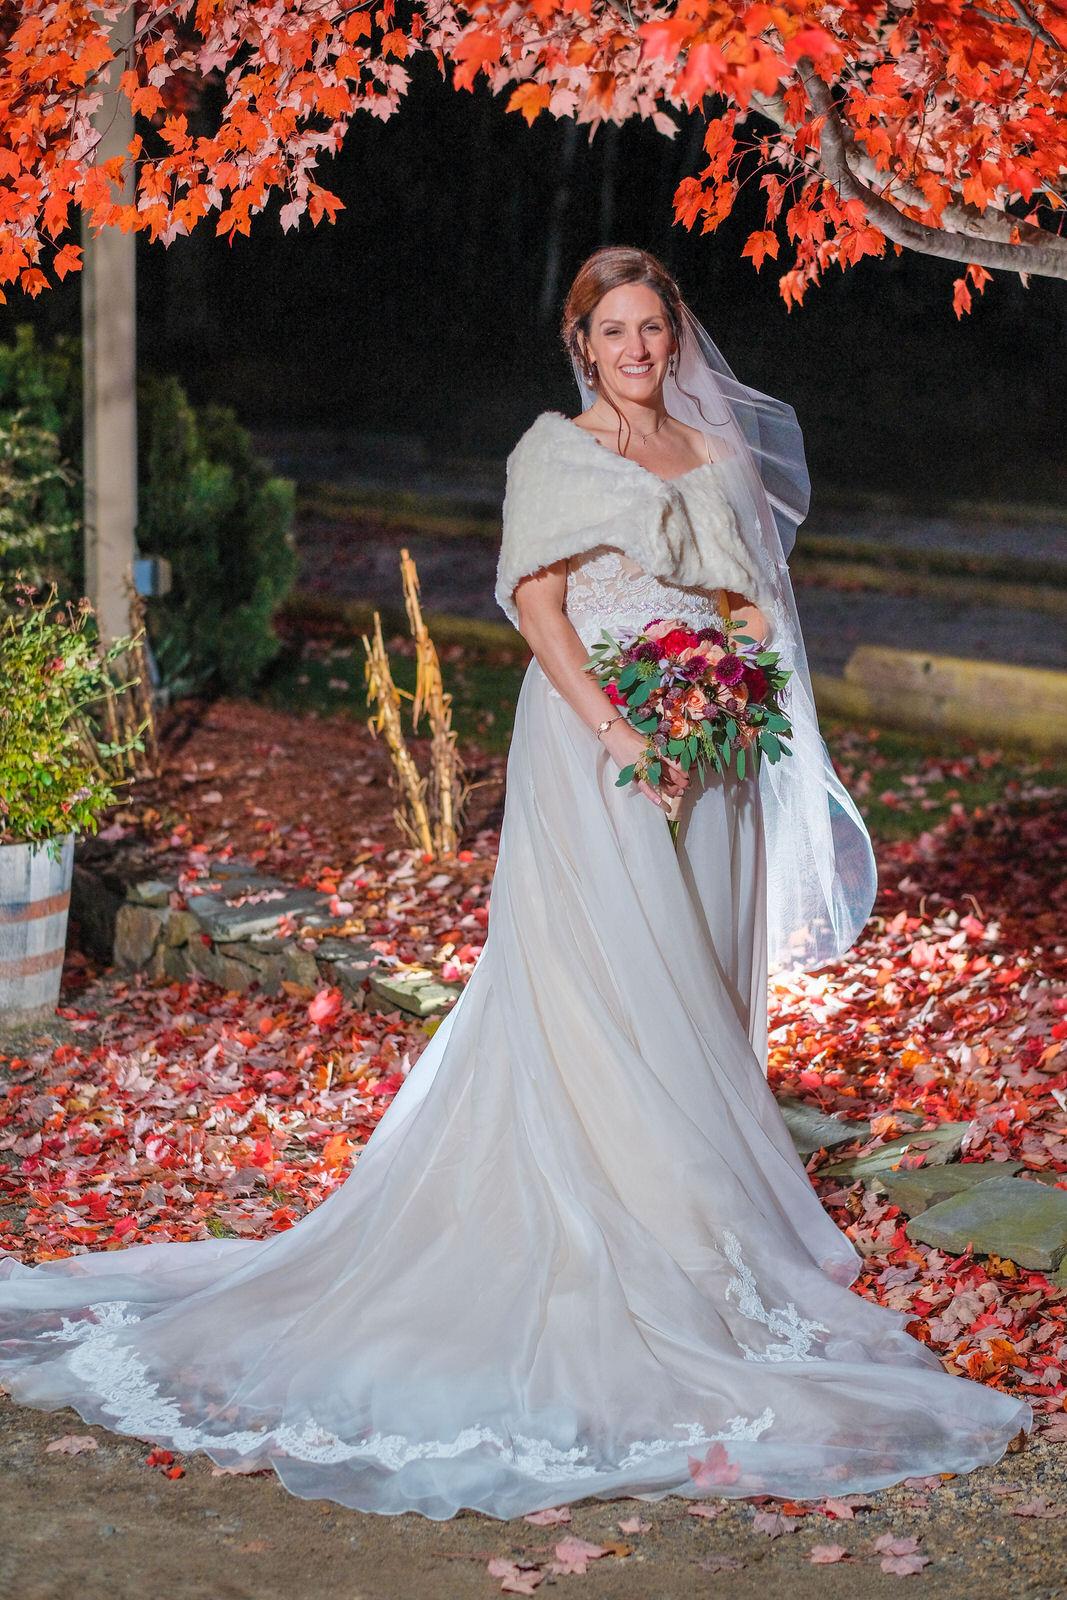 Zorvino-Vineyards-Fall-Wedding-Photography-547.jpg